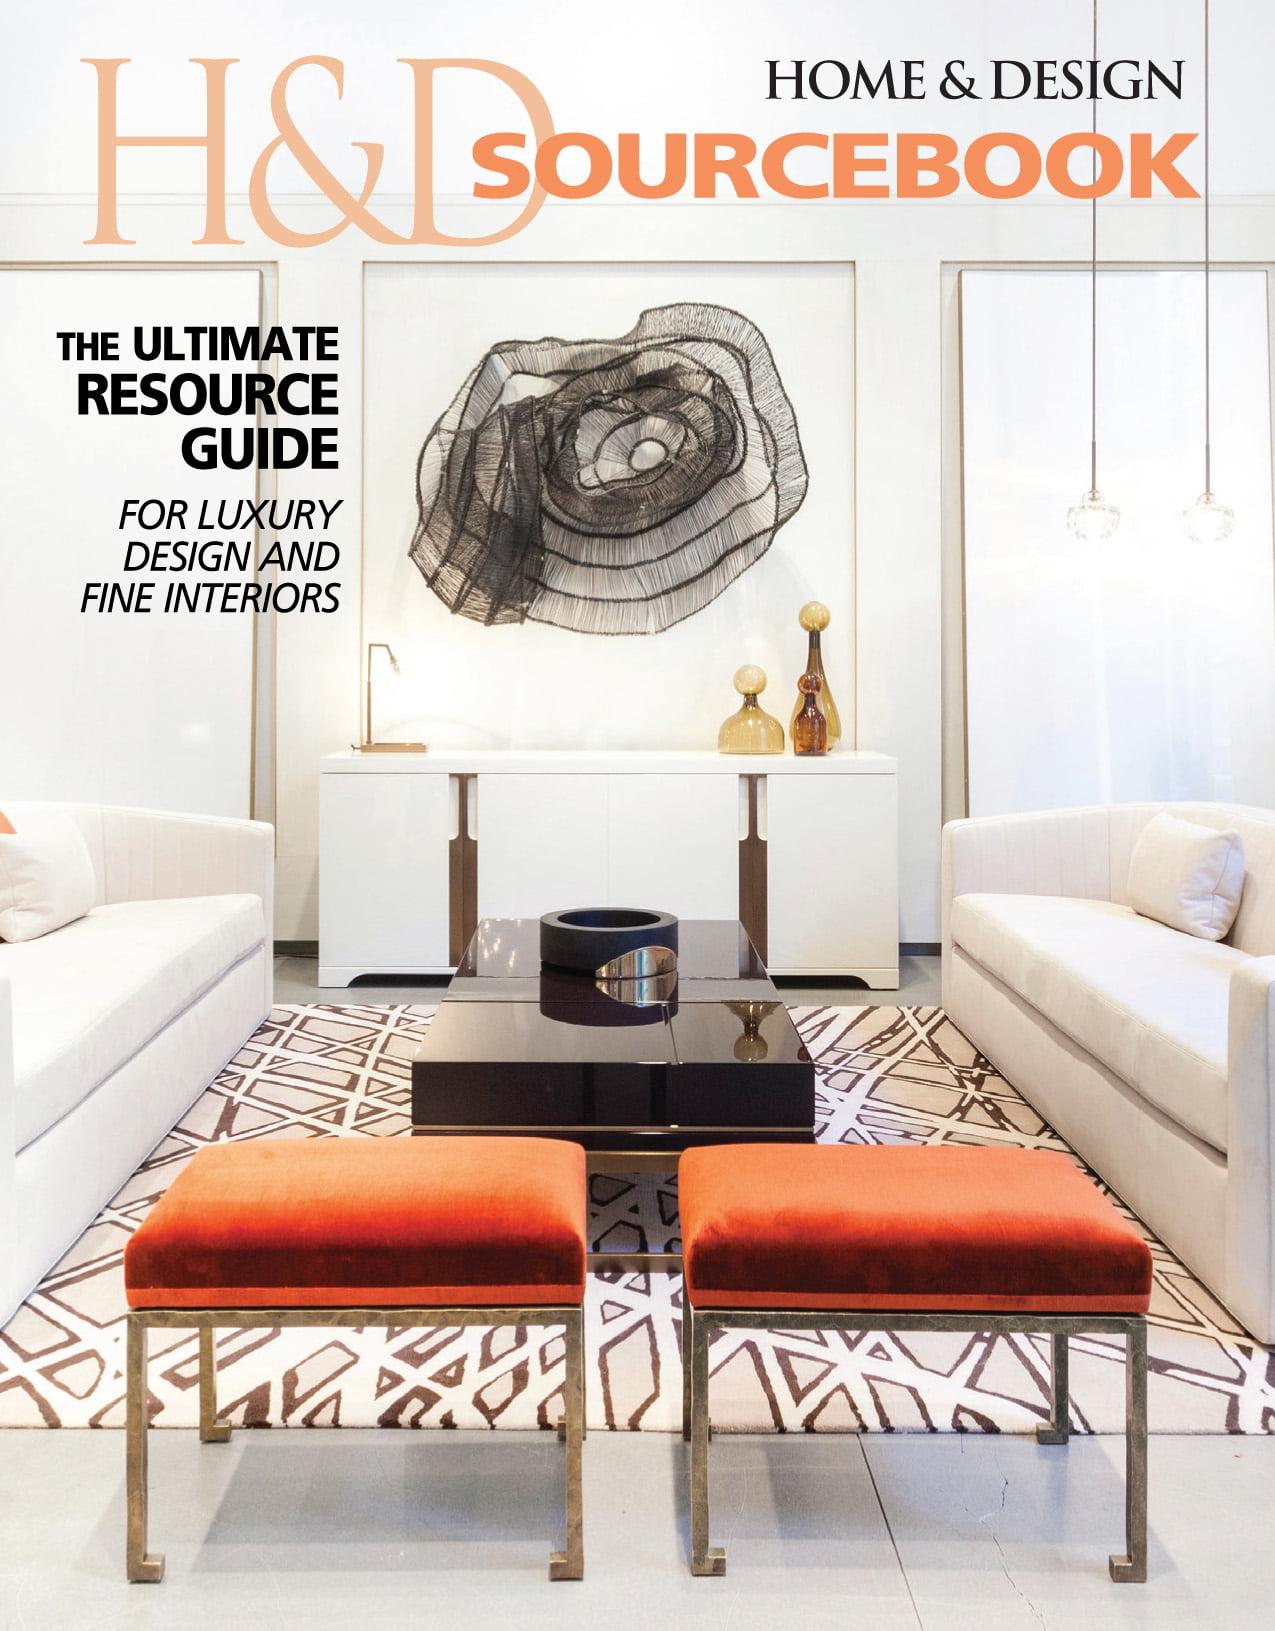 Sourcebook 2015 Archives - Home & Design Magazine